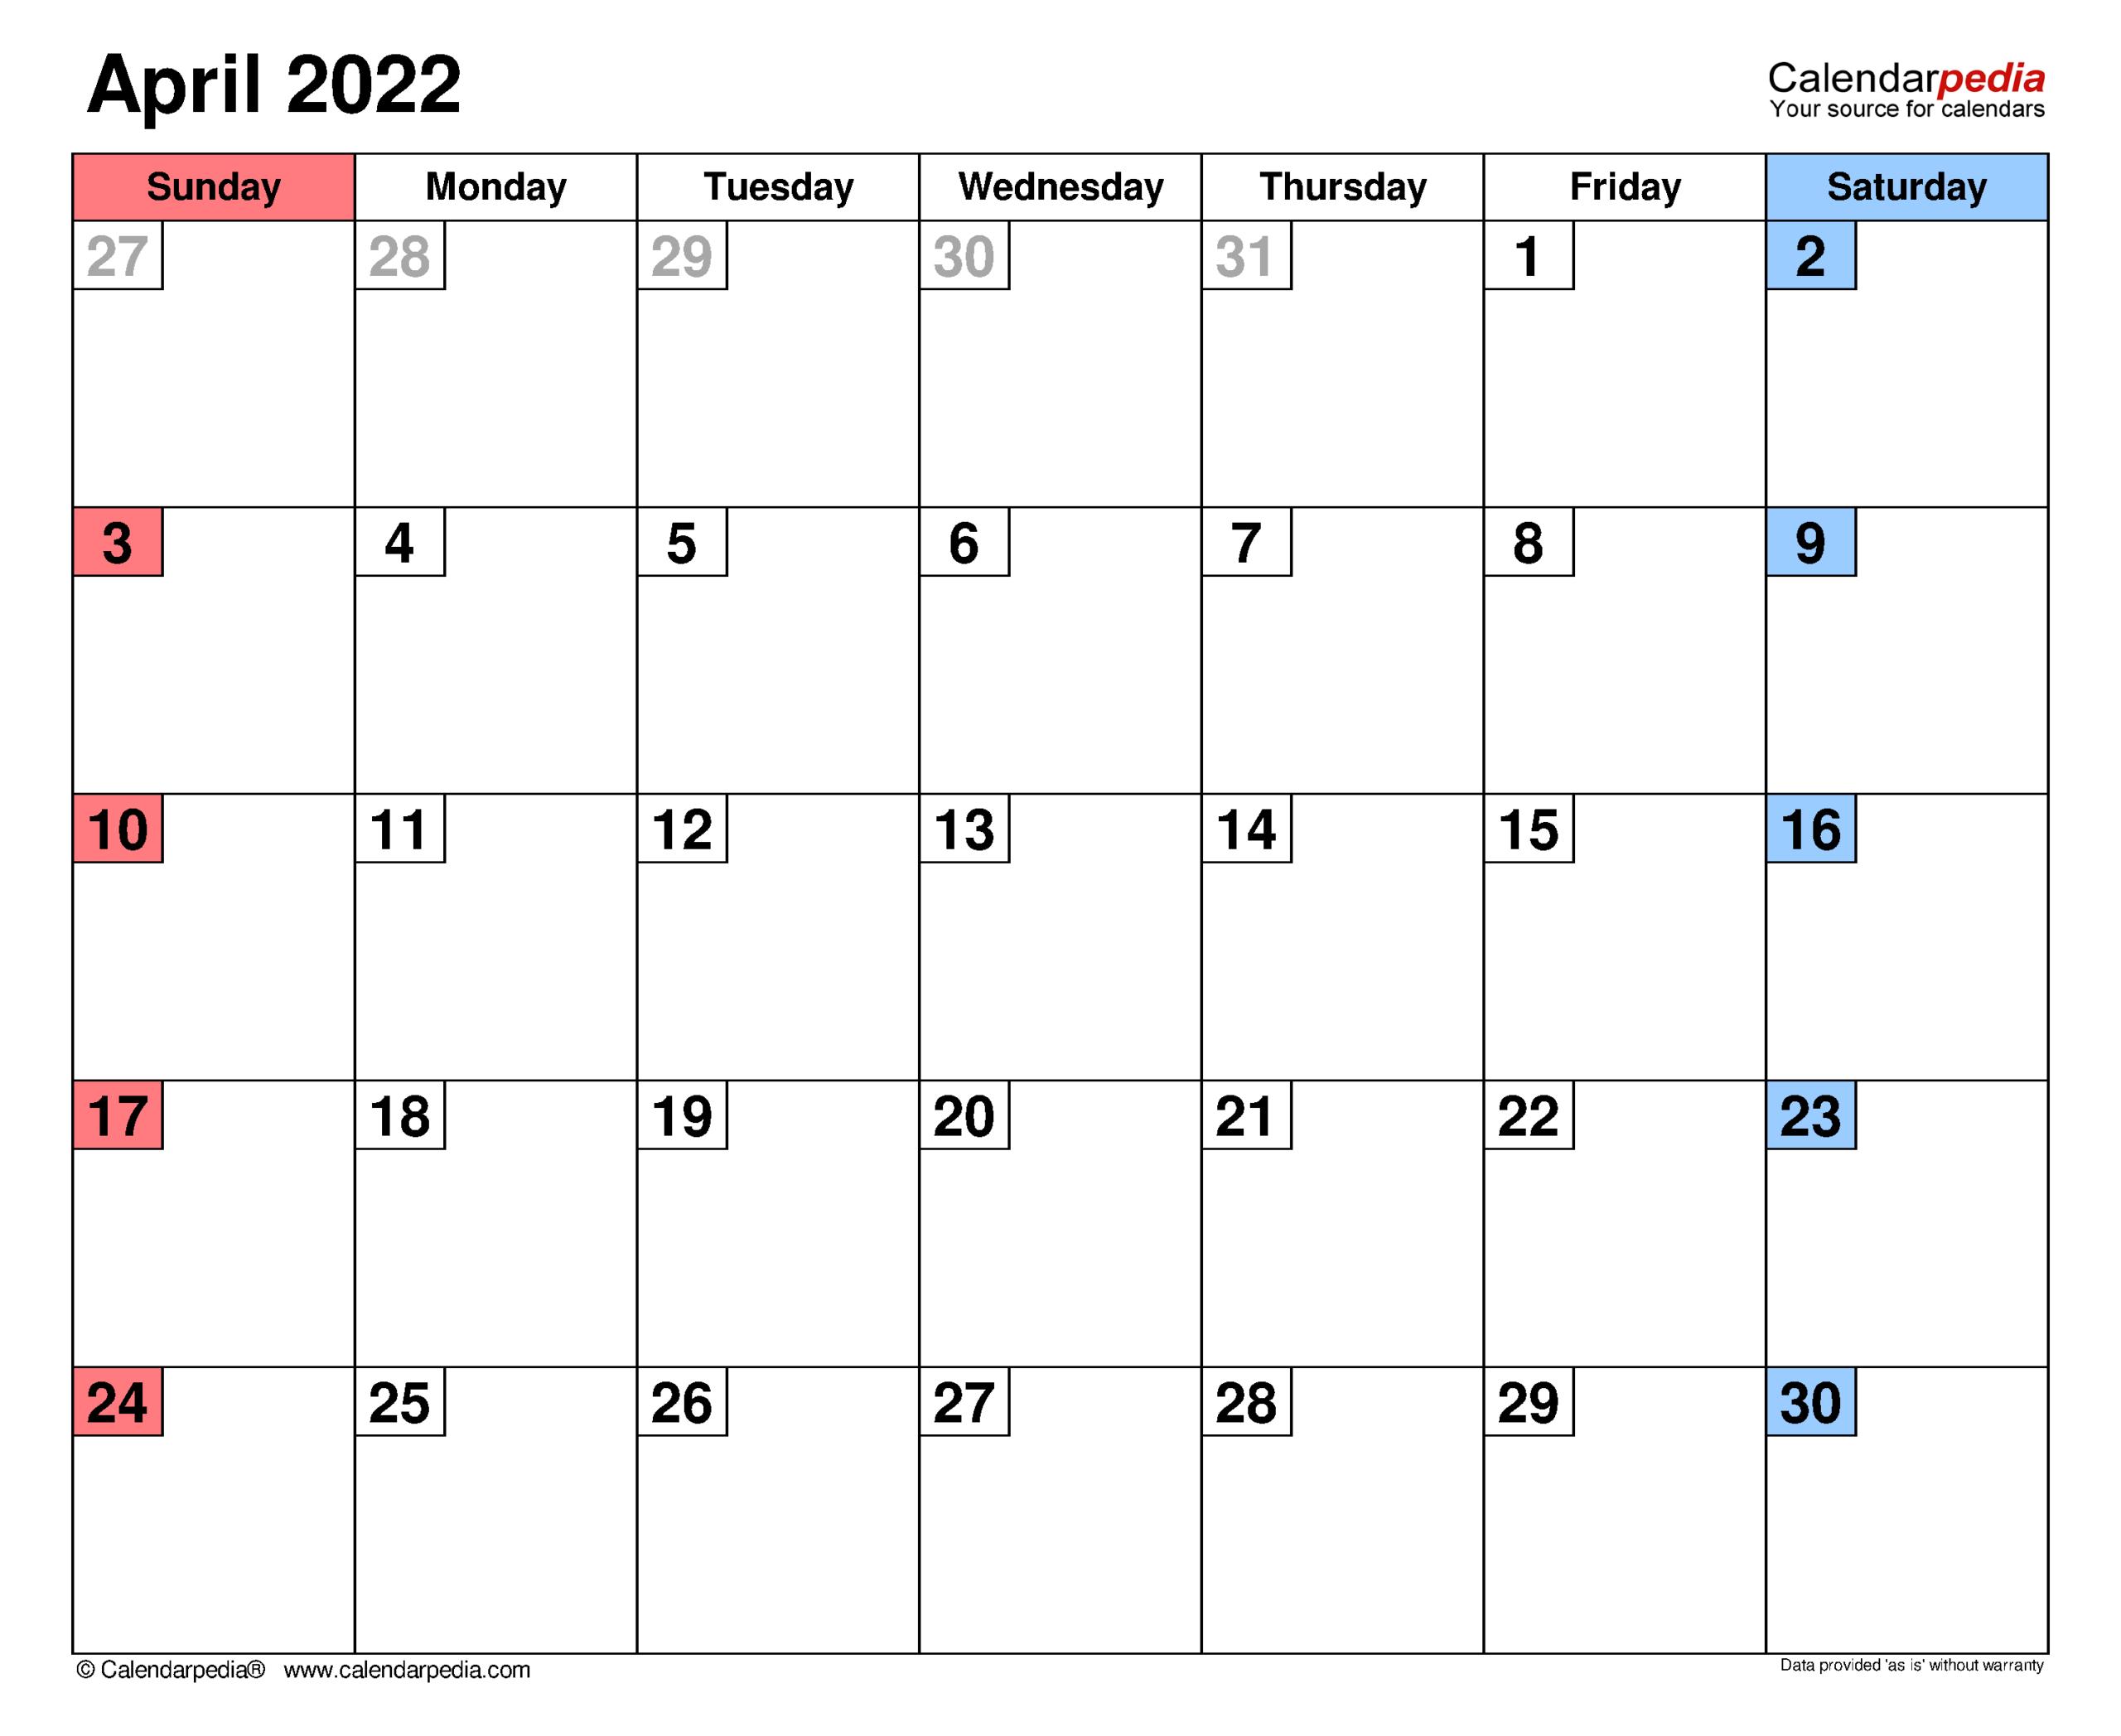 April 2022 Calendar | Templates For Word, Excel And Pdf inside April May Calendar 2022